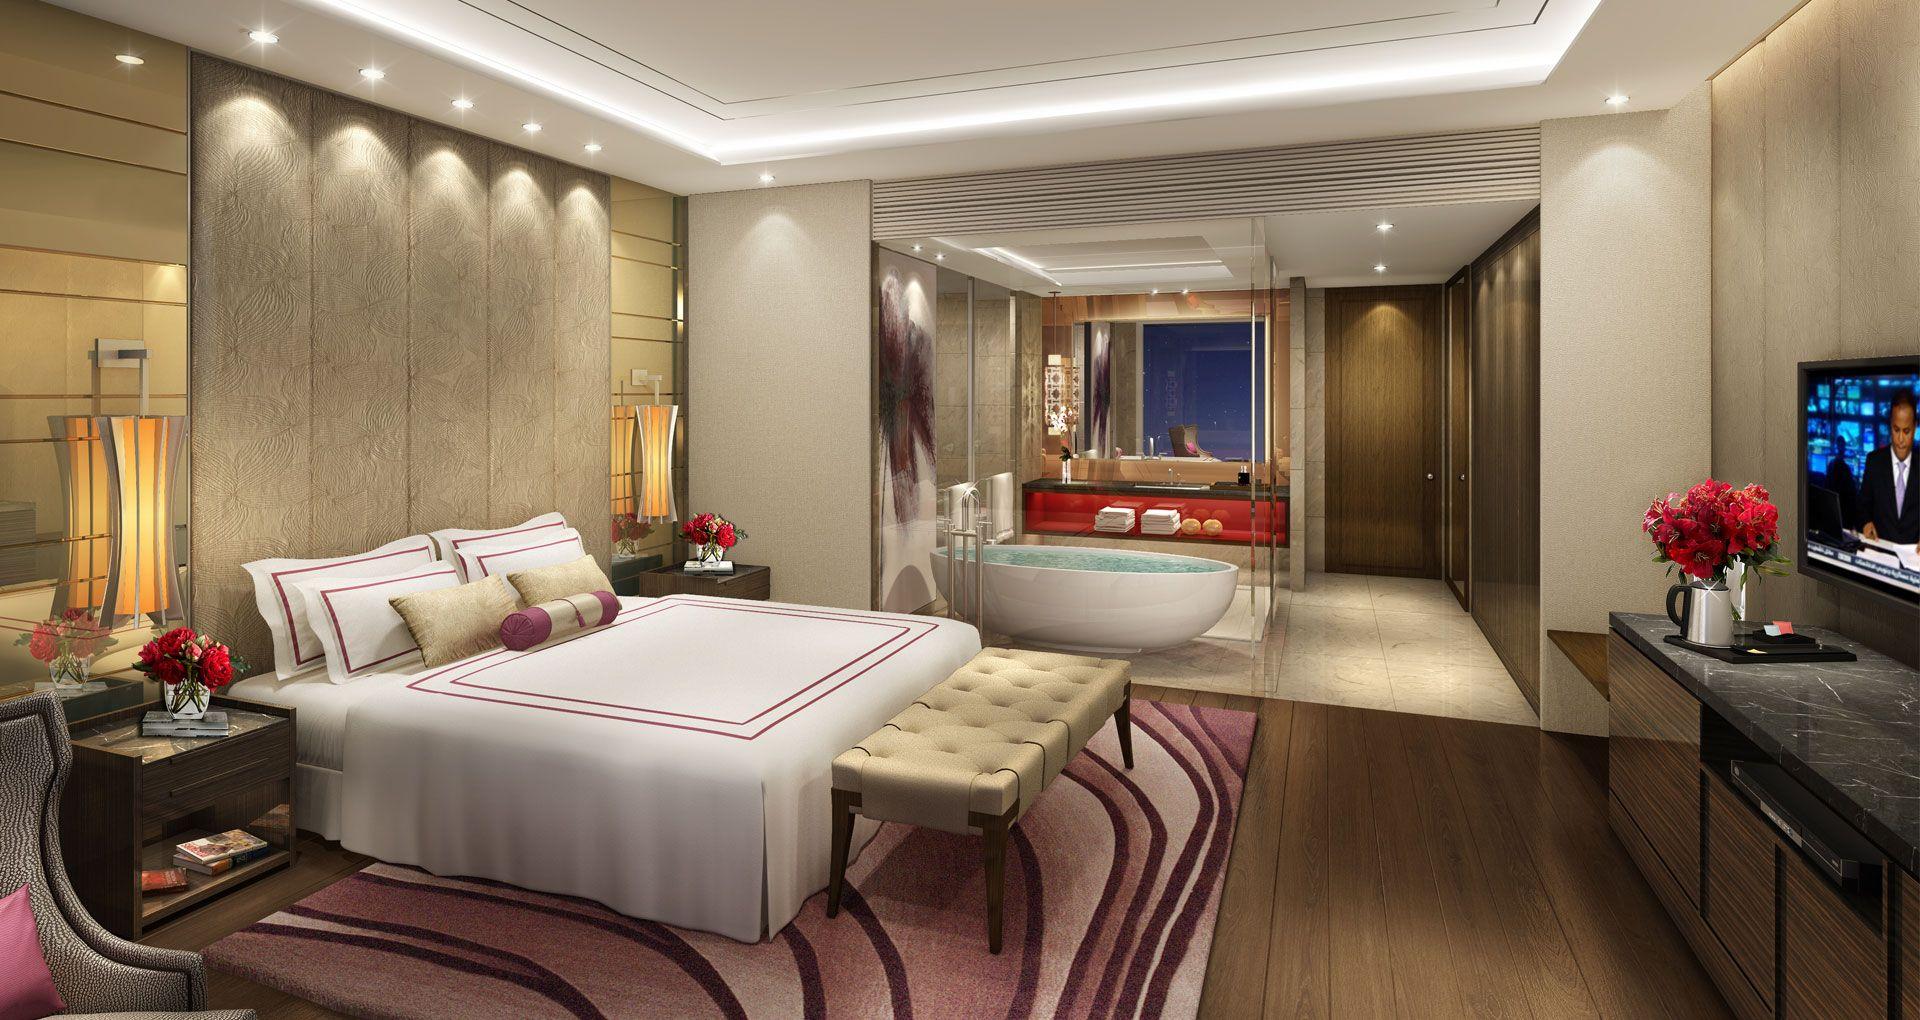 Hotels Interior penthouse hotel - angeles city, philipines designedstudio hba